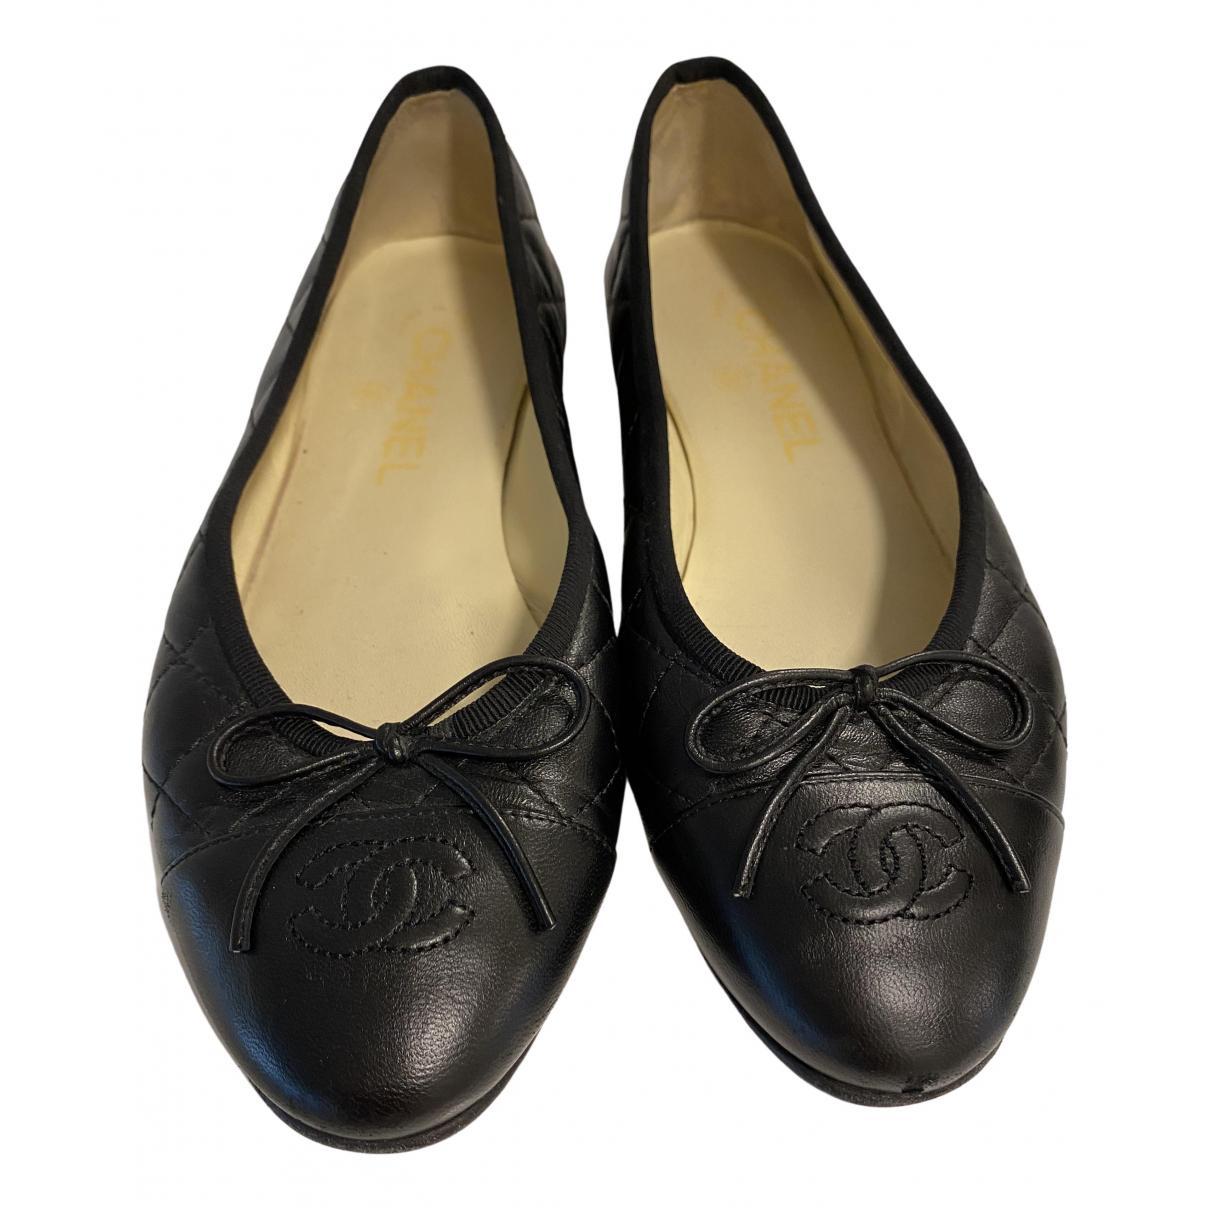 Chanel N Black Leather Ballet flats for Women 37 EU